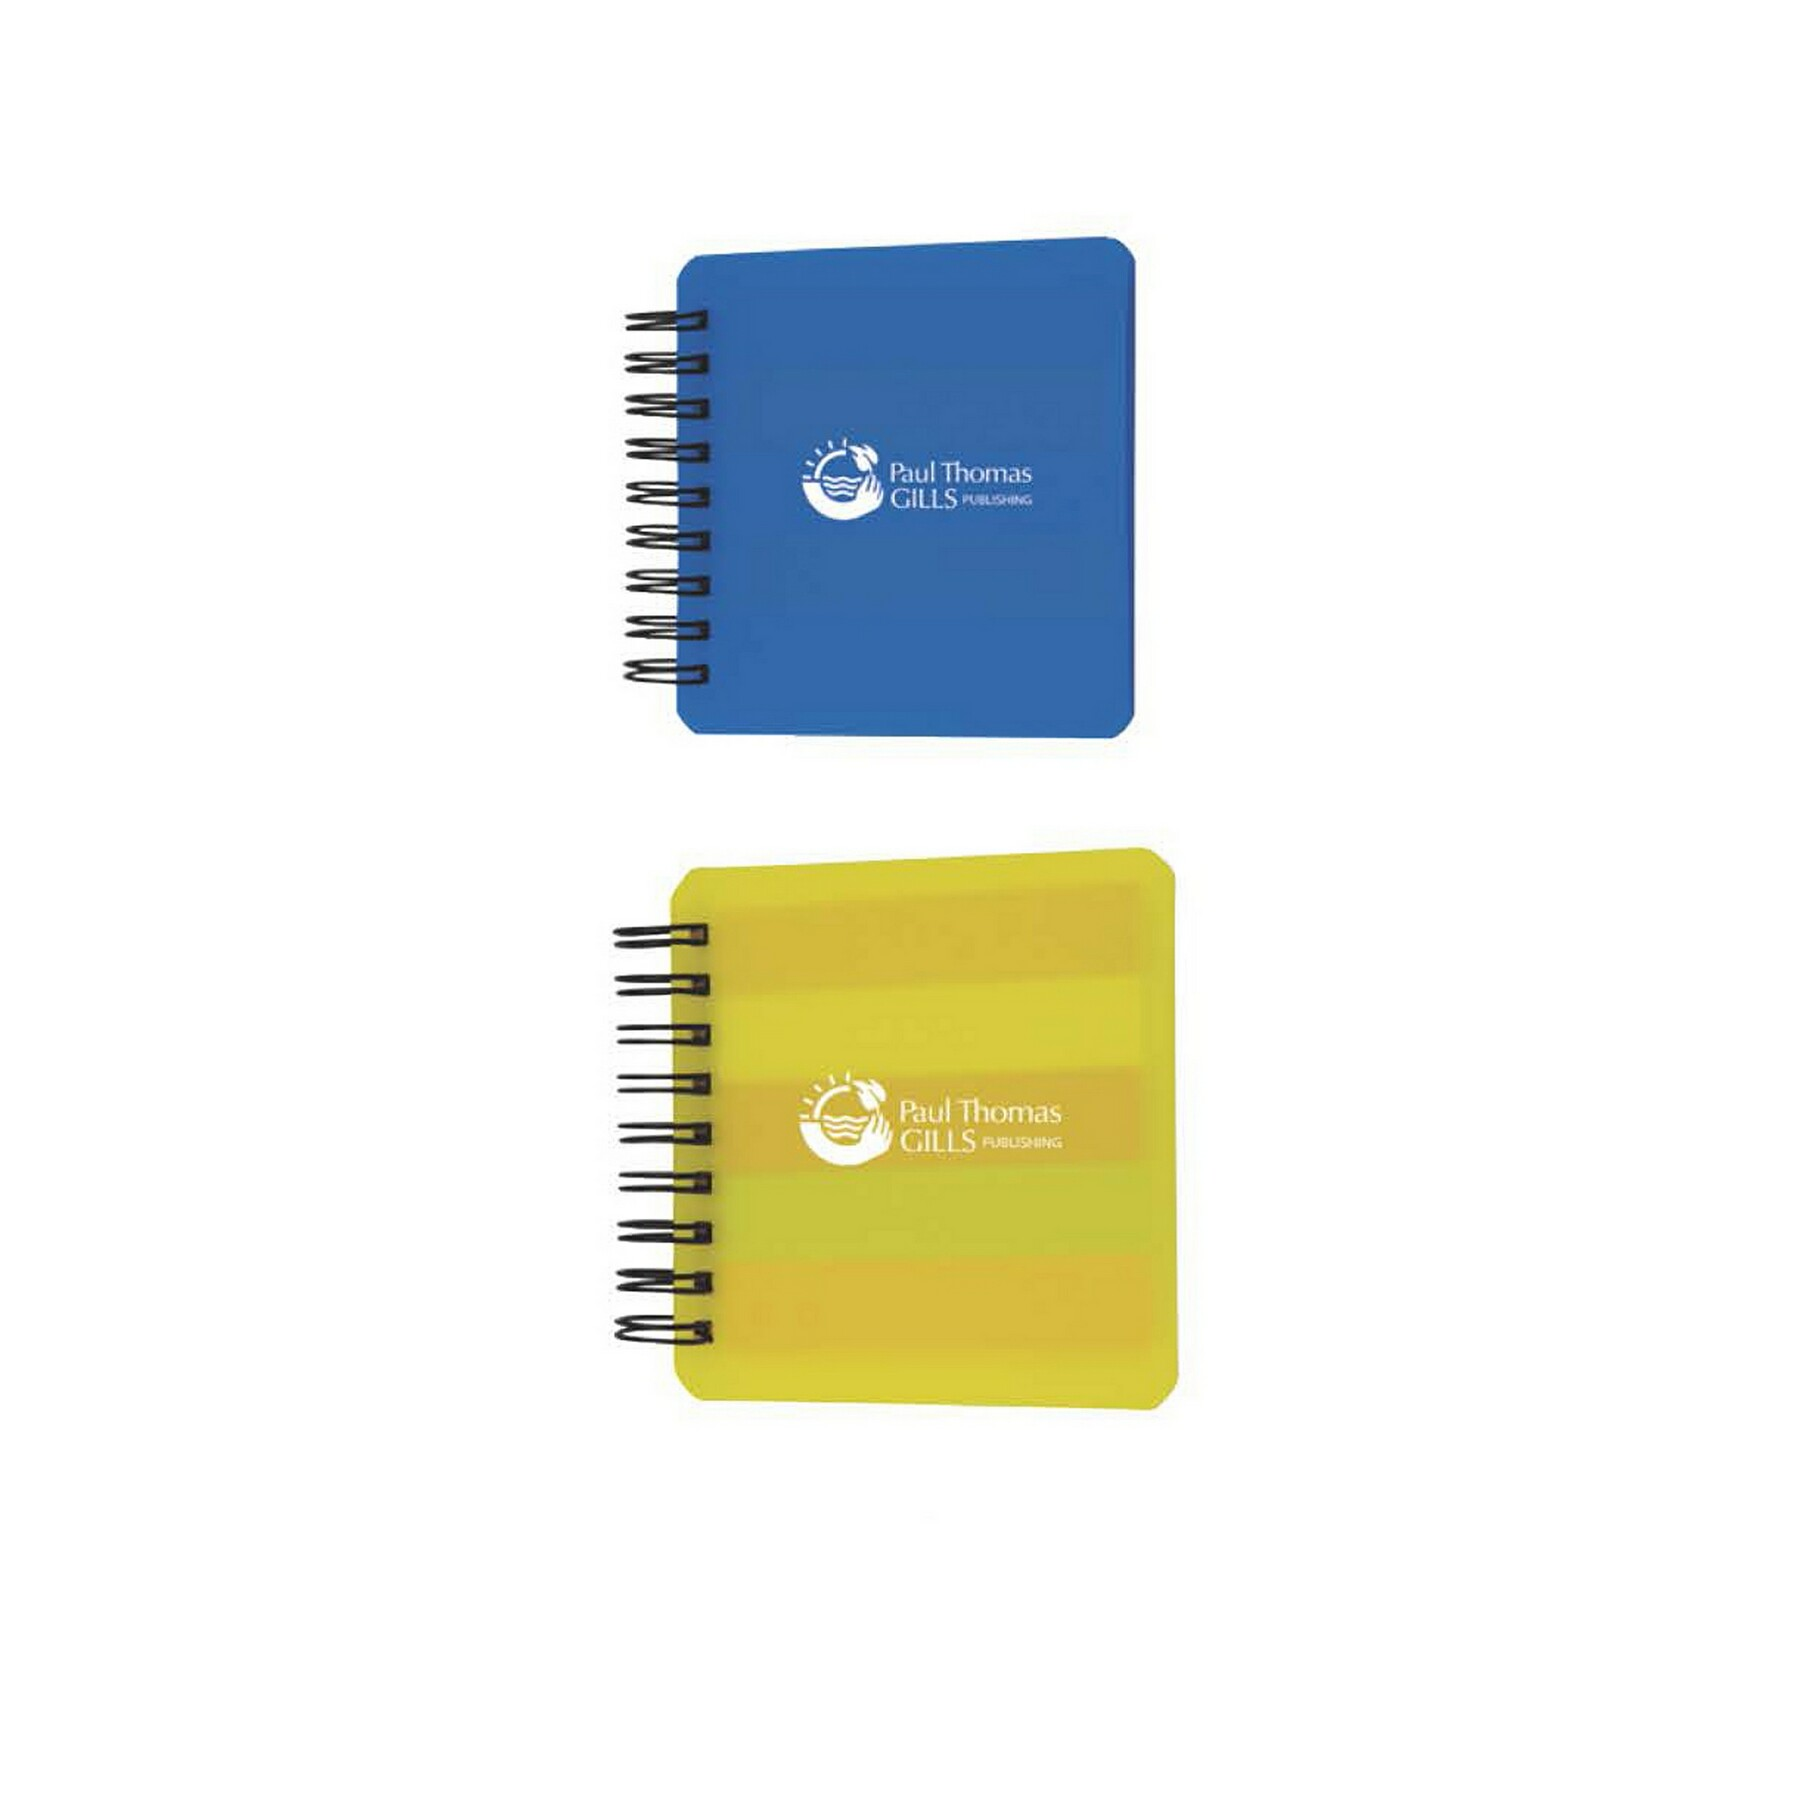 BIC Adhesive Memo Notepad - 1 Colour Imprint, #PFN